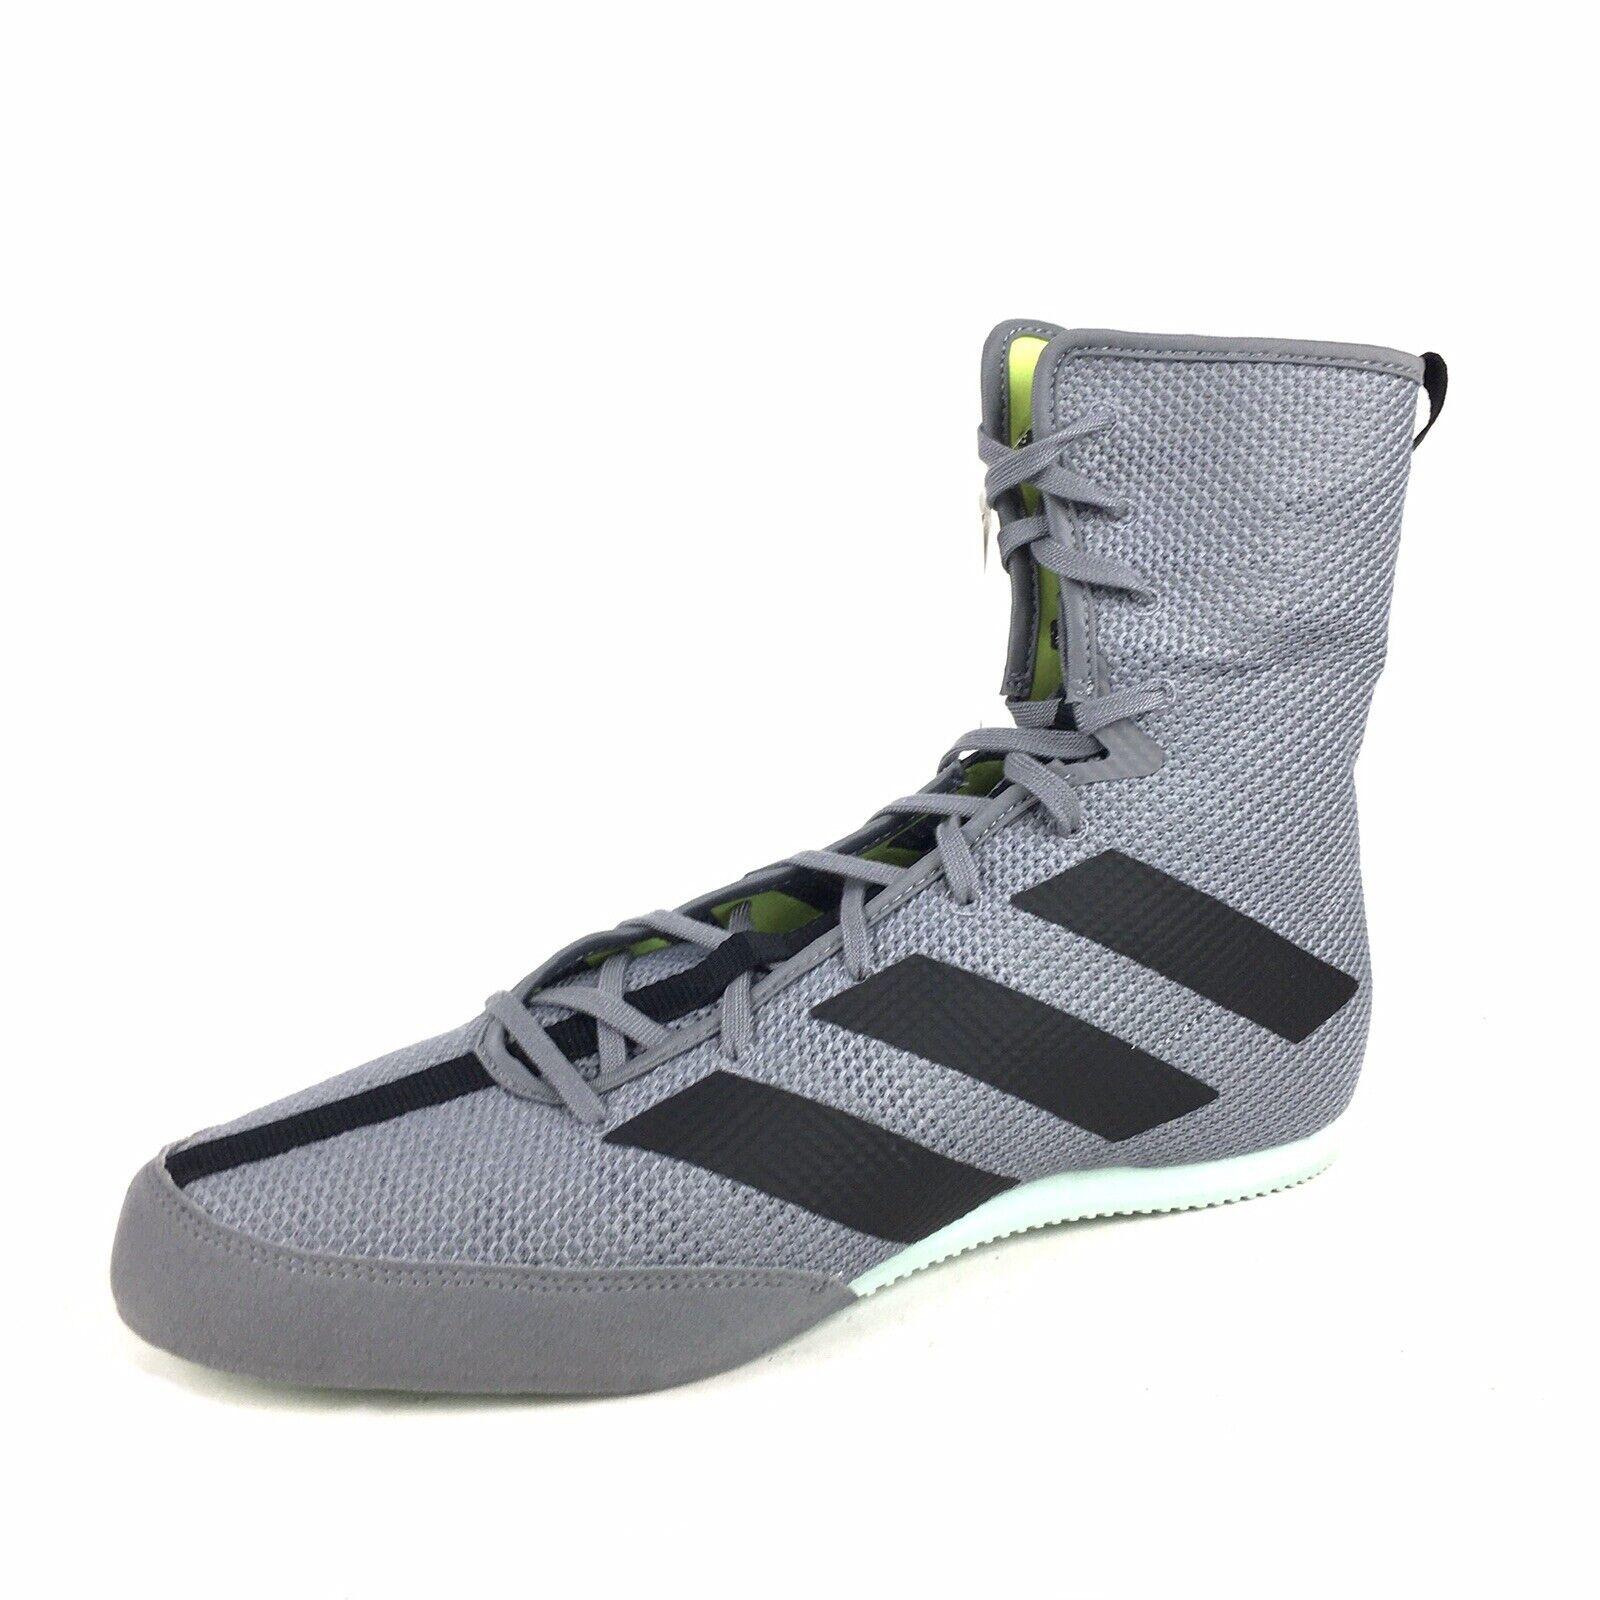 Adidas Box Hog 3 Mens Size 11 Boxing Shoes Grey Black Green EF2976 New